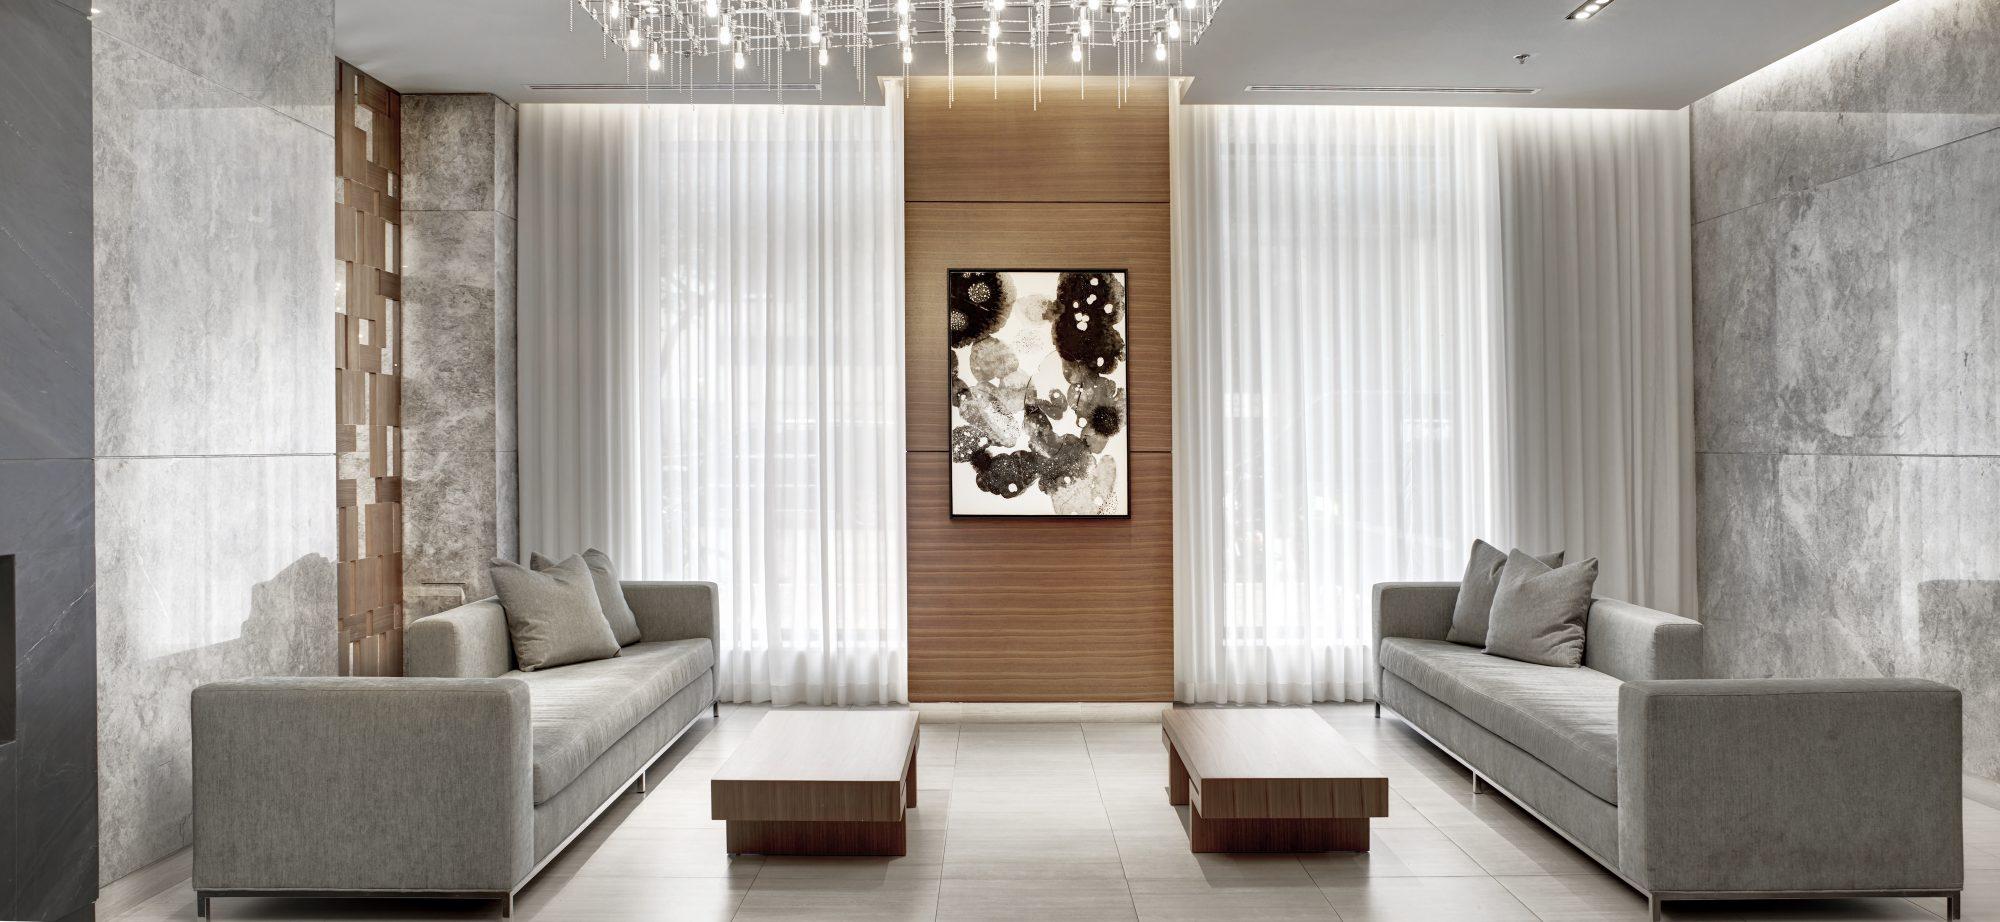 Grey lobby with light fixture